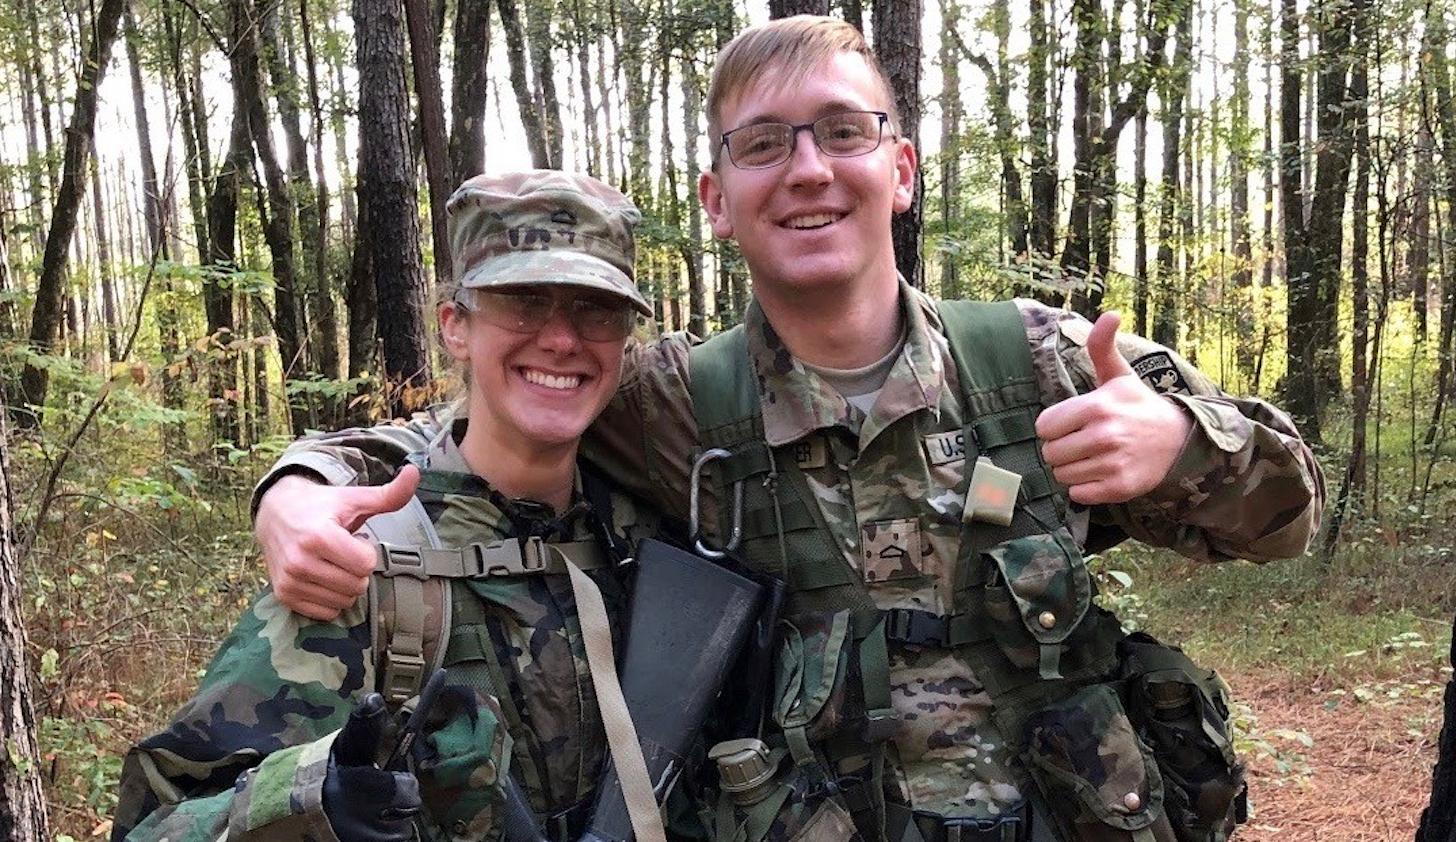 January's Highlighted Cadet: Ben Powdermaker